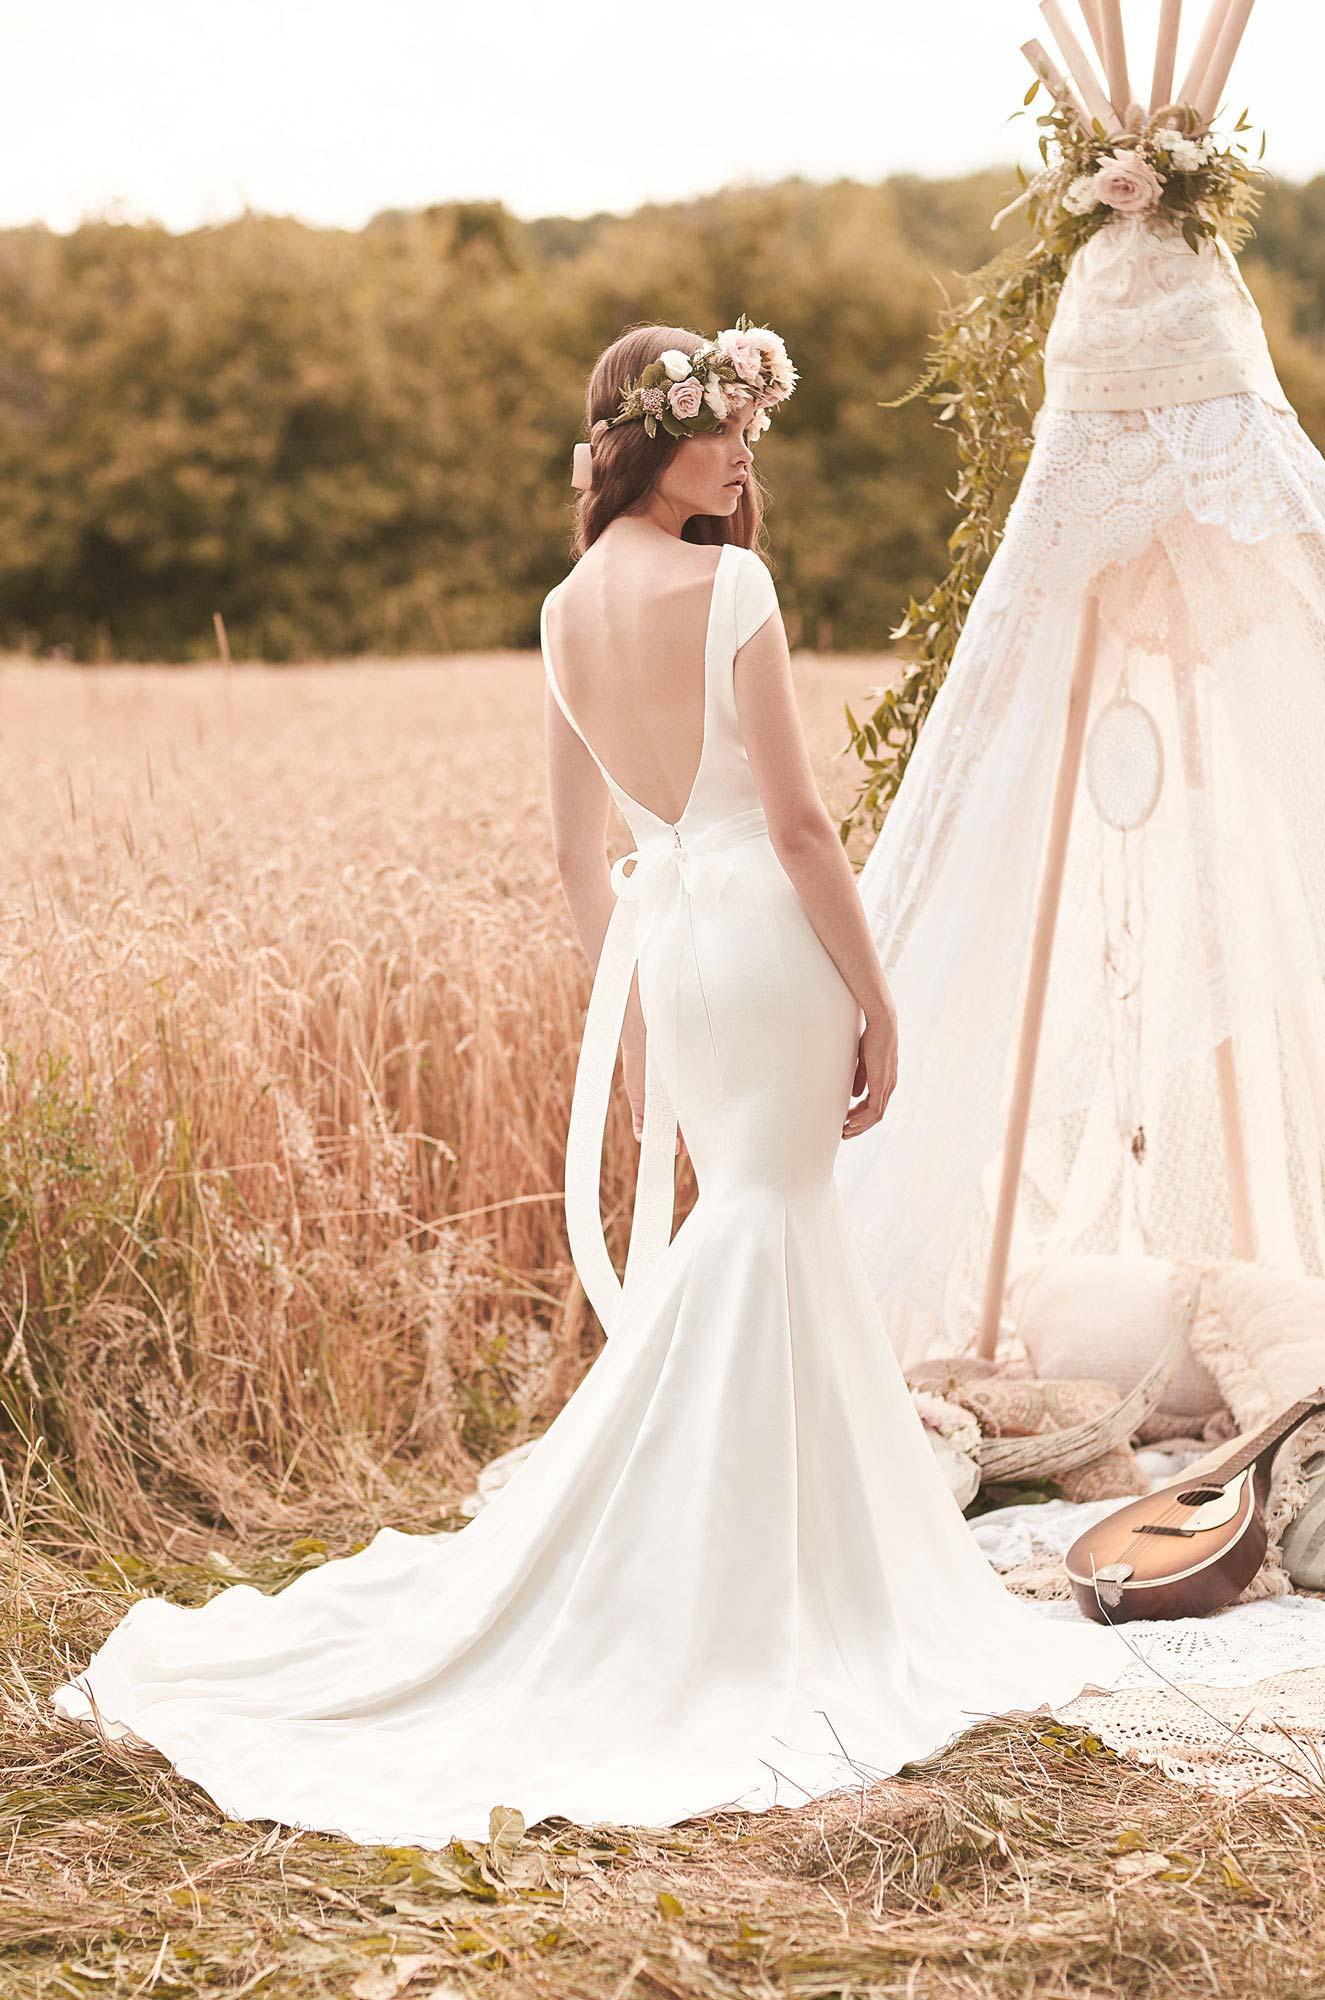 Cap Sleeve Wedding Dress - Style #2061 | Mikaella Bridal